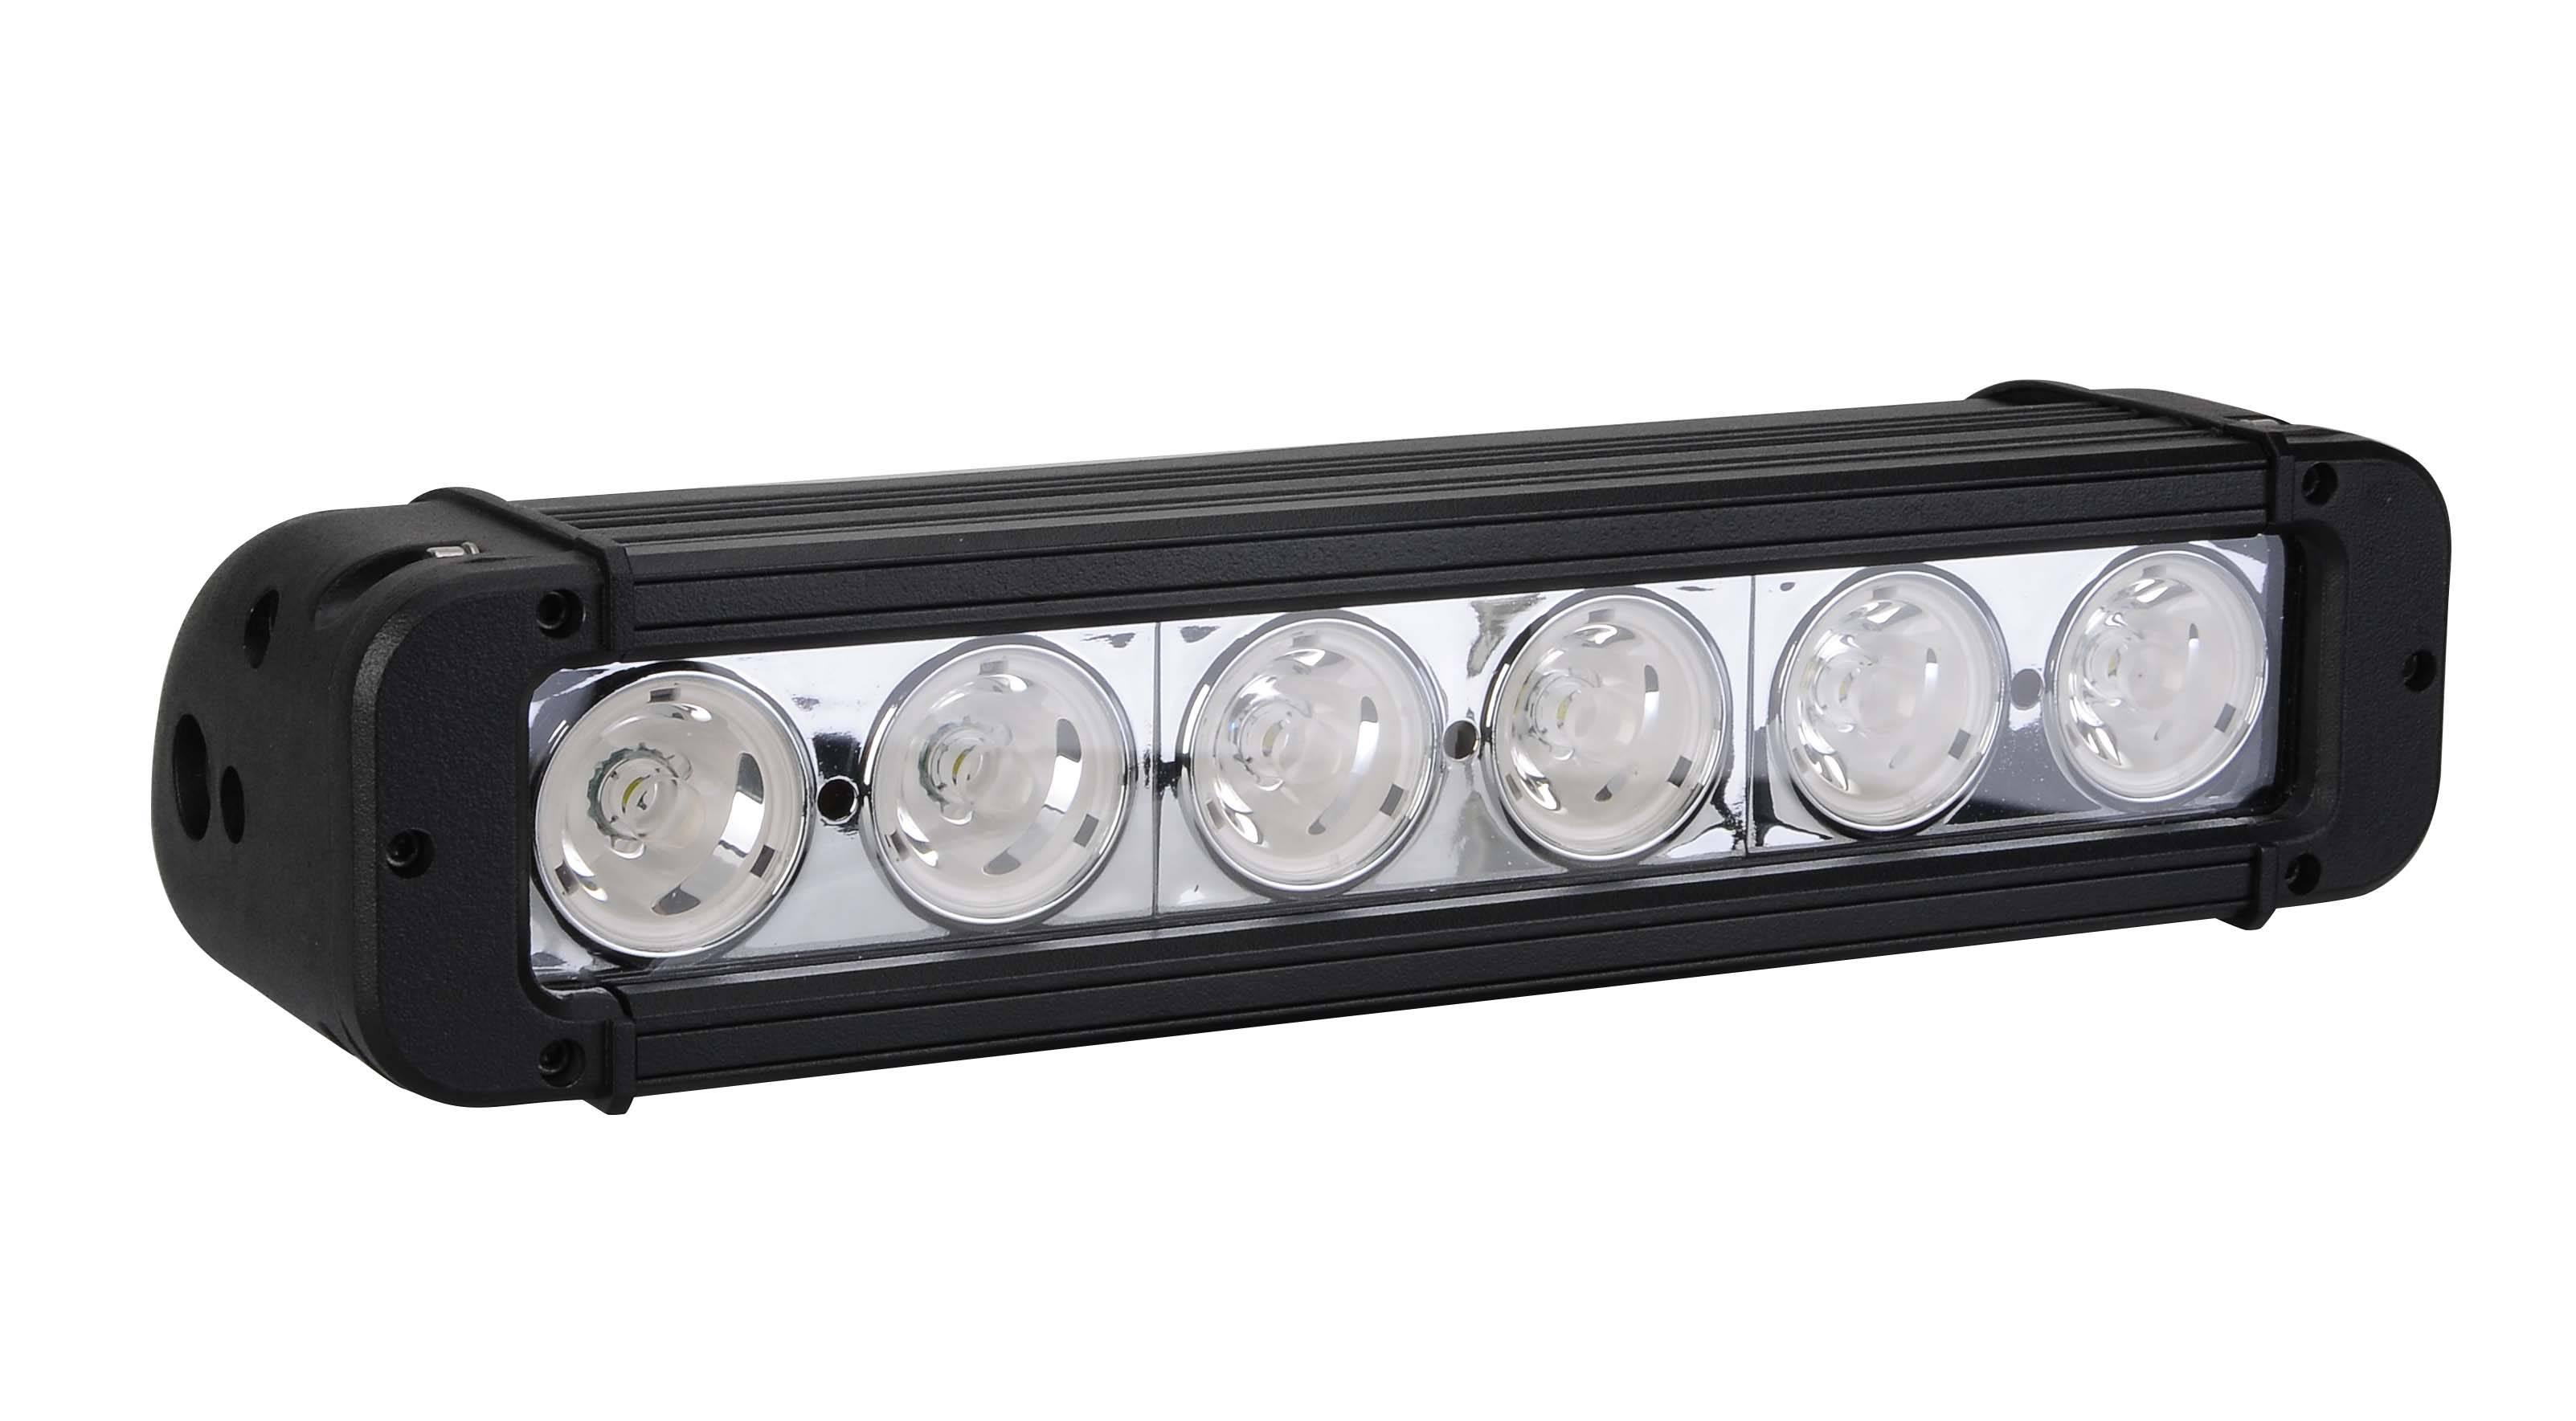 11 inch 60W CREE LED Work Light Bars Spot Light Flood Light